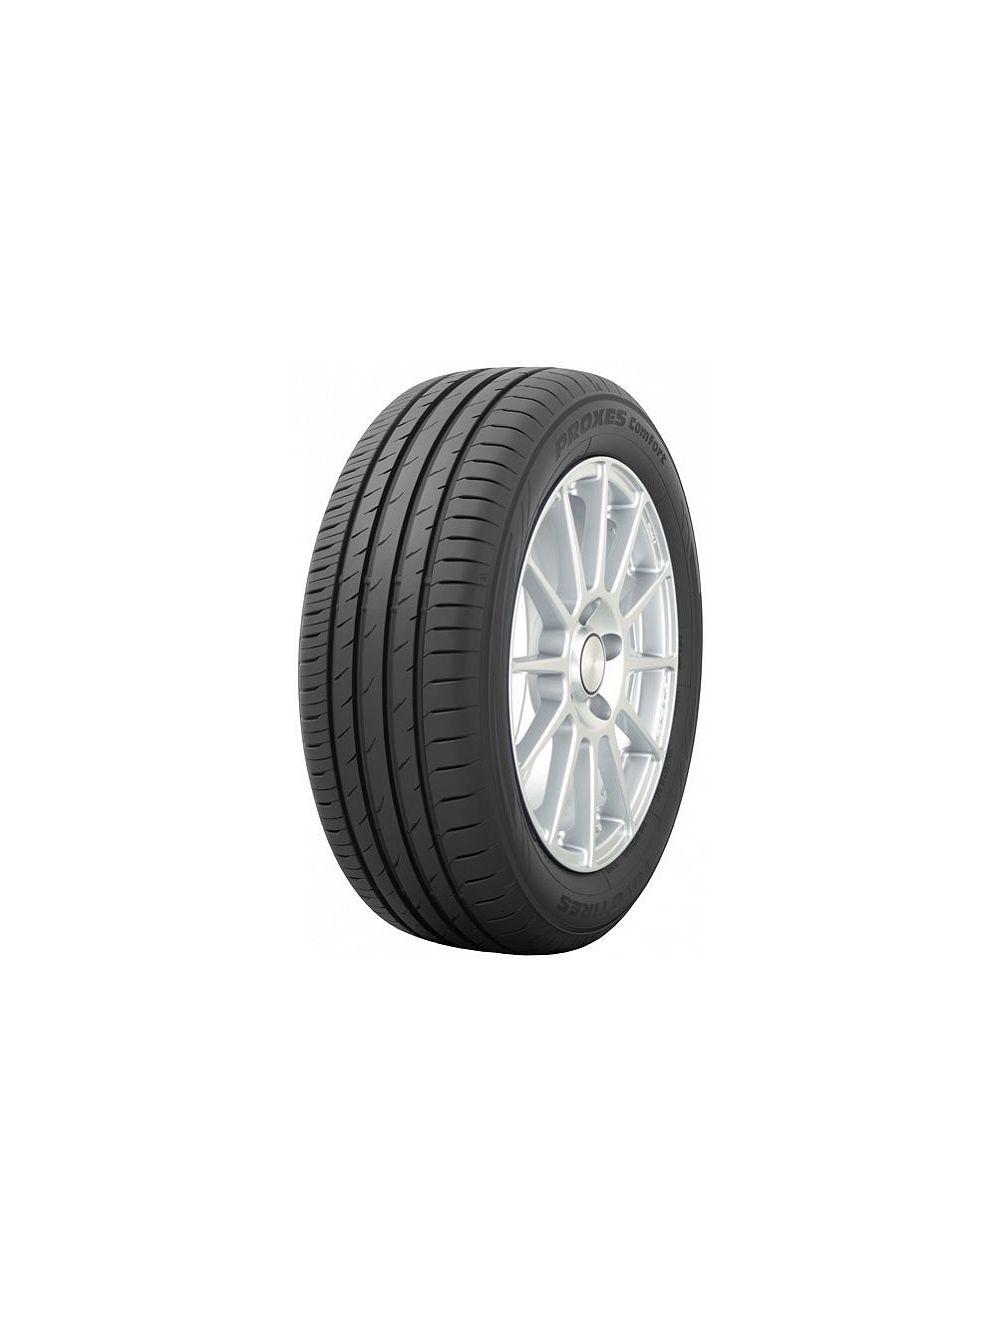 Toyo 225/55R17 W Proxes Comfort XL Nyári gumi